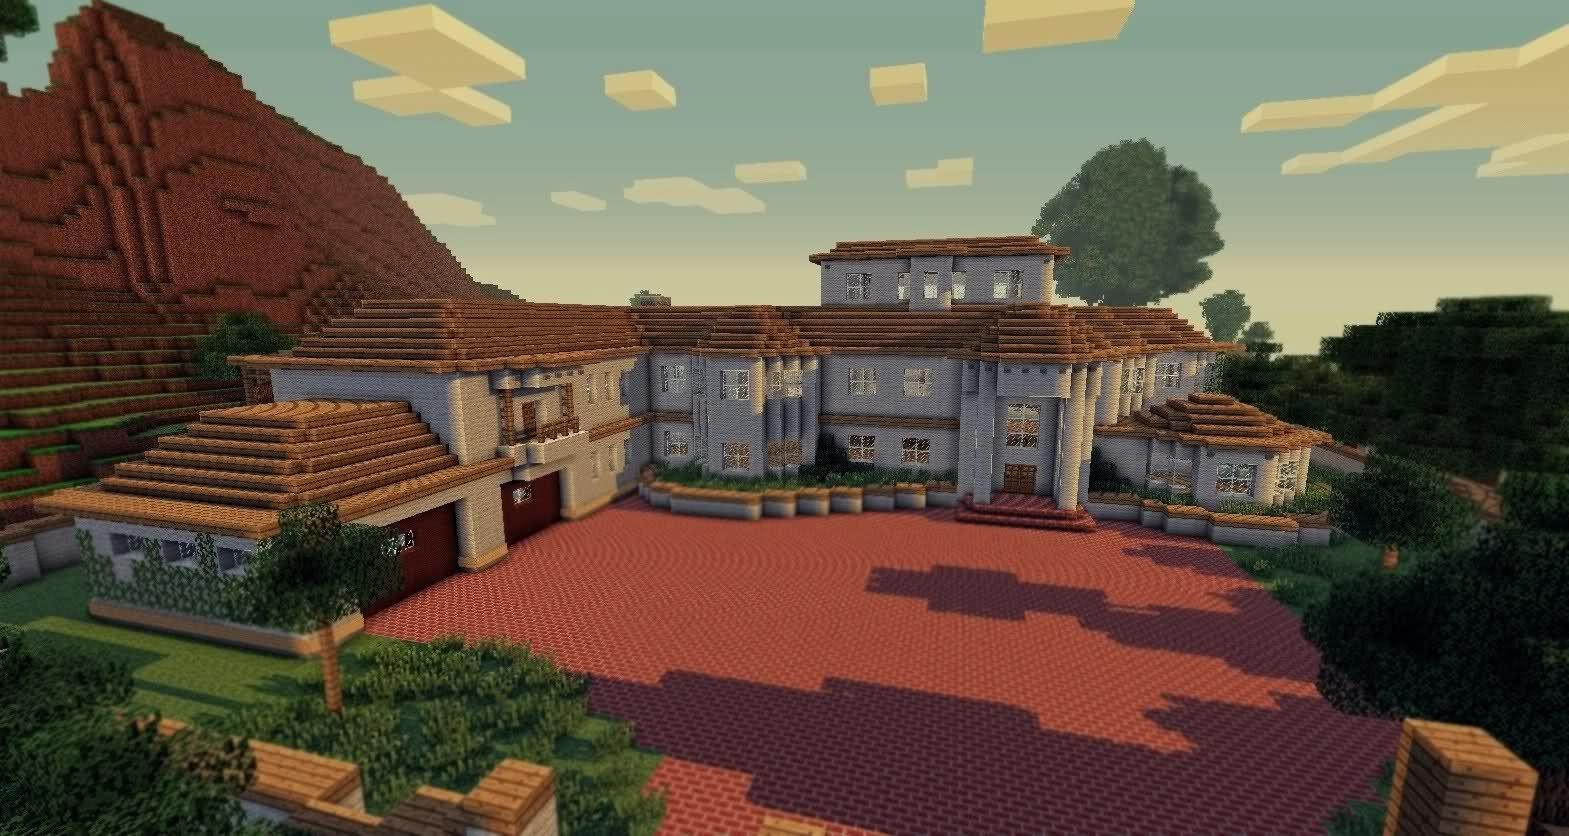 Minecraft Papercraft House Minecraft House Schematic Imageareafo Pinterest